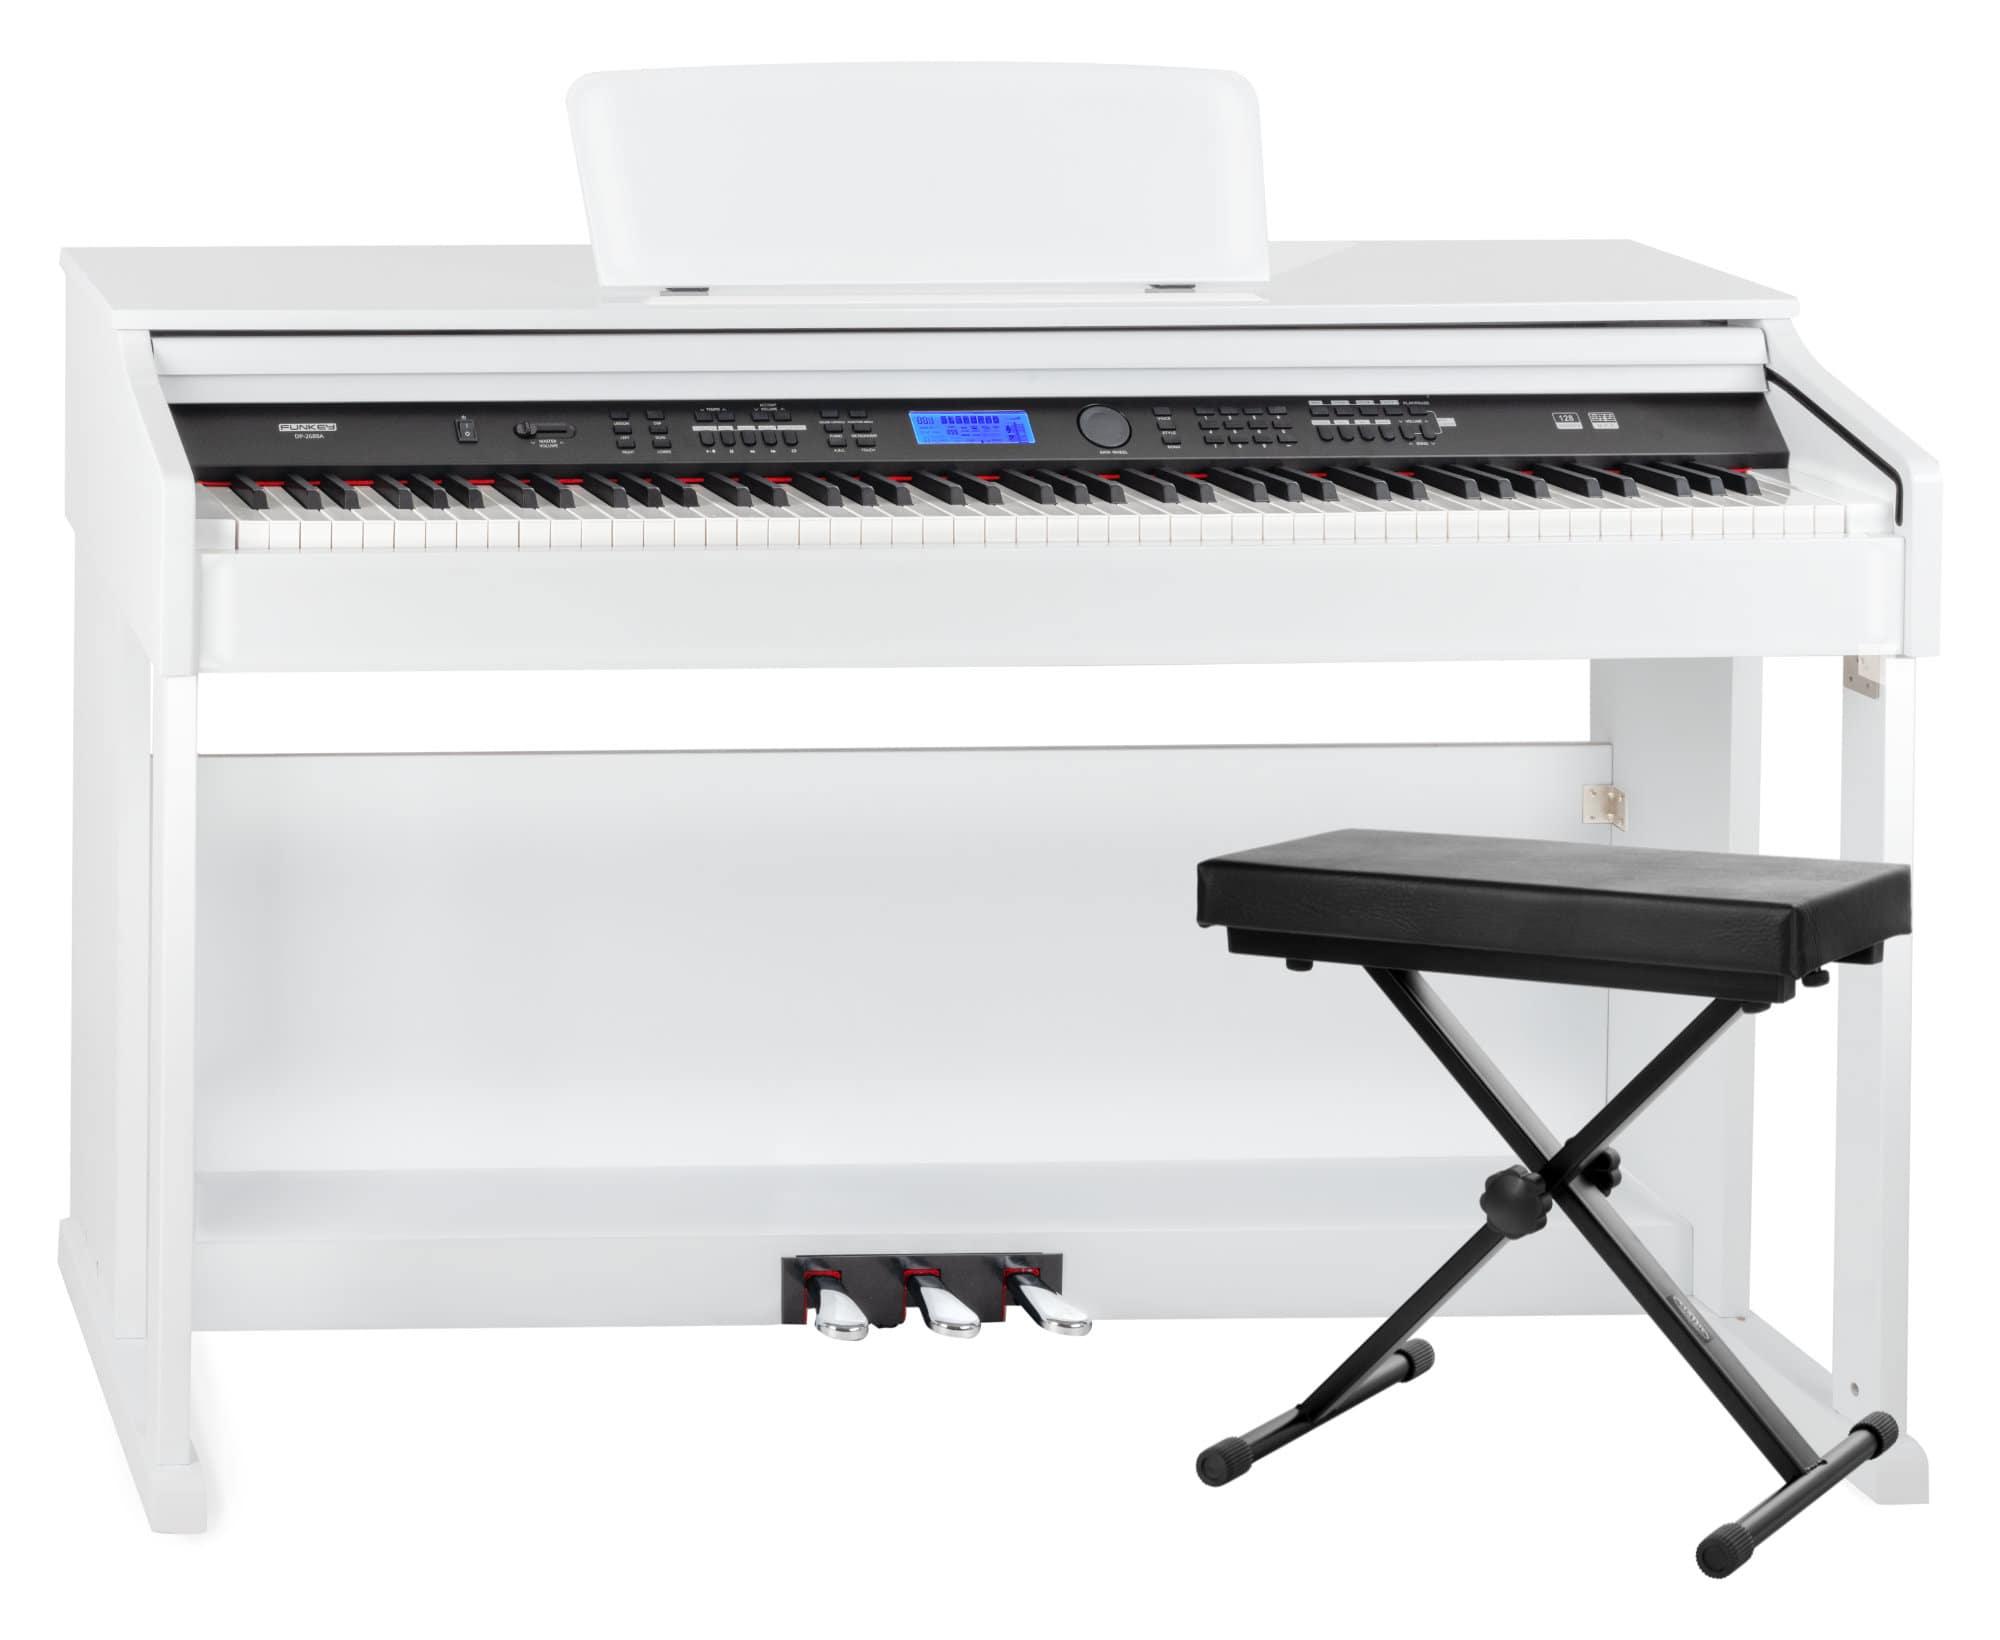 Digitalpianos - FunKey DP 2688A WH Digitalpiano weiß Hochglanz Bank Set - Onlineshop Musikhaus Kirstein